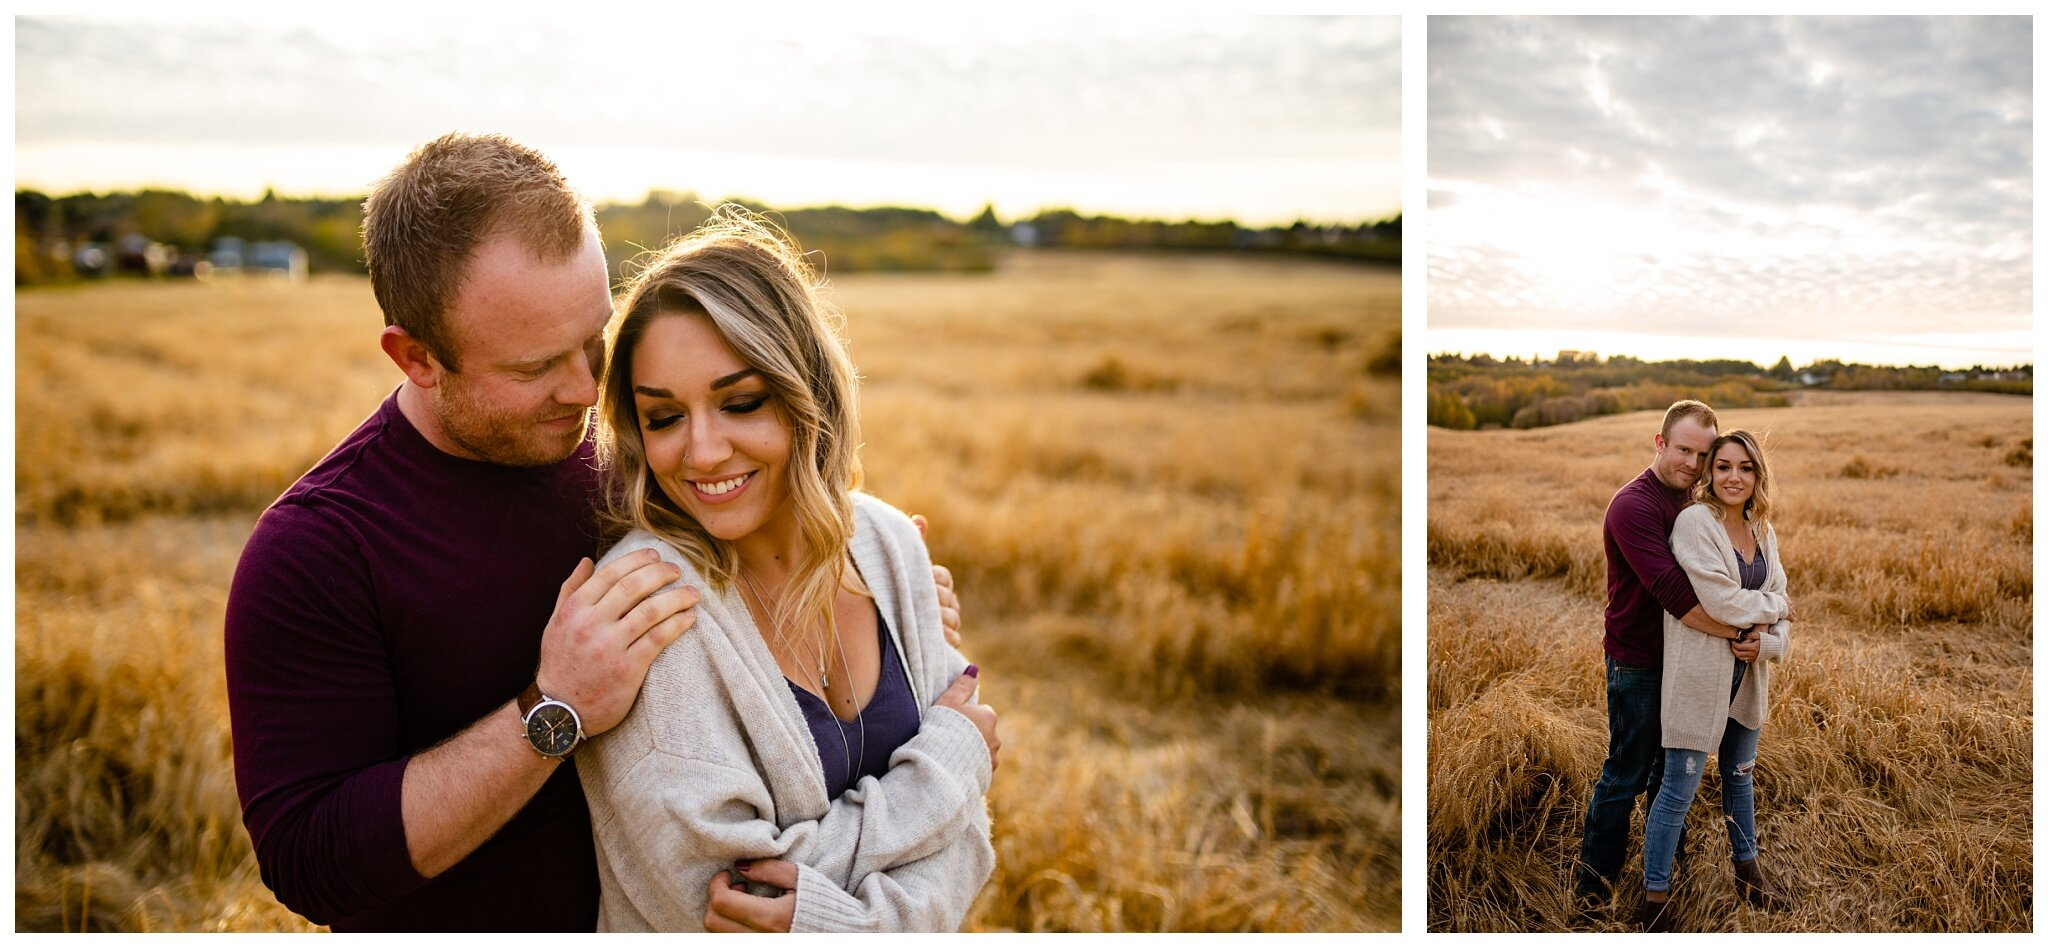 Edmonton Engagement Photographer Romantic Couples Photos Local YEG Strathcona County_0007.jpg